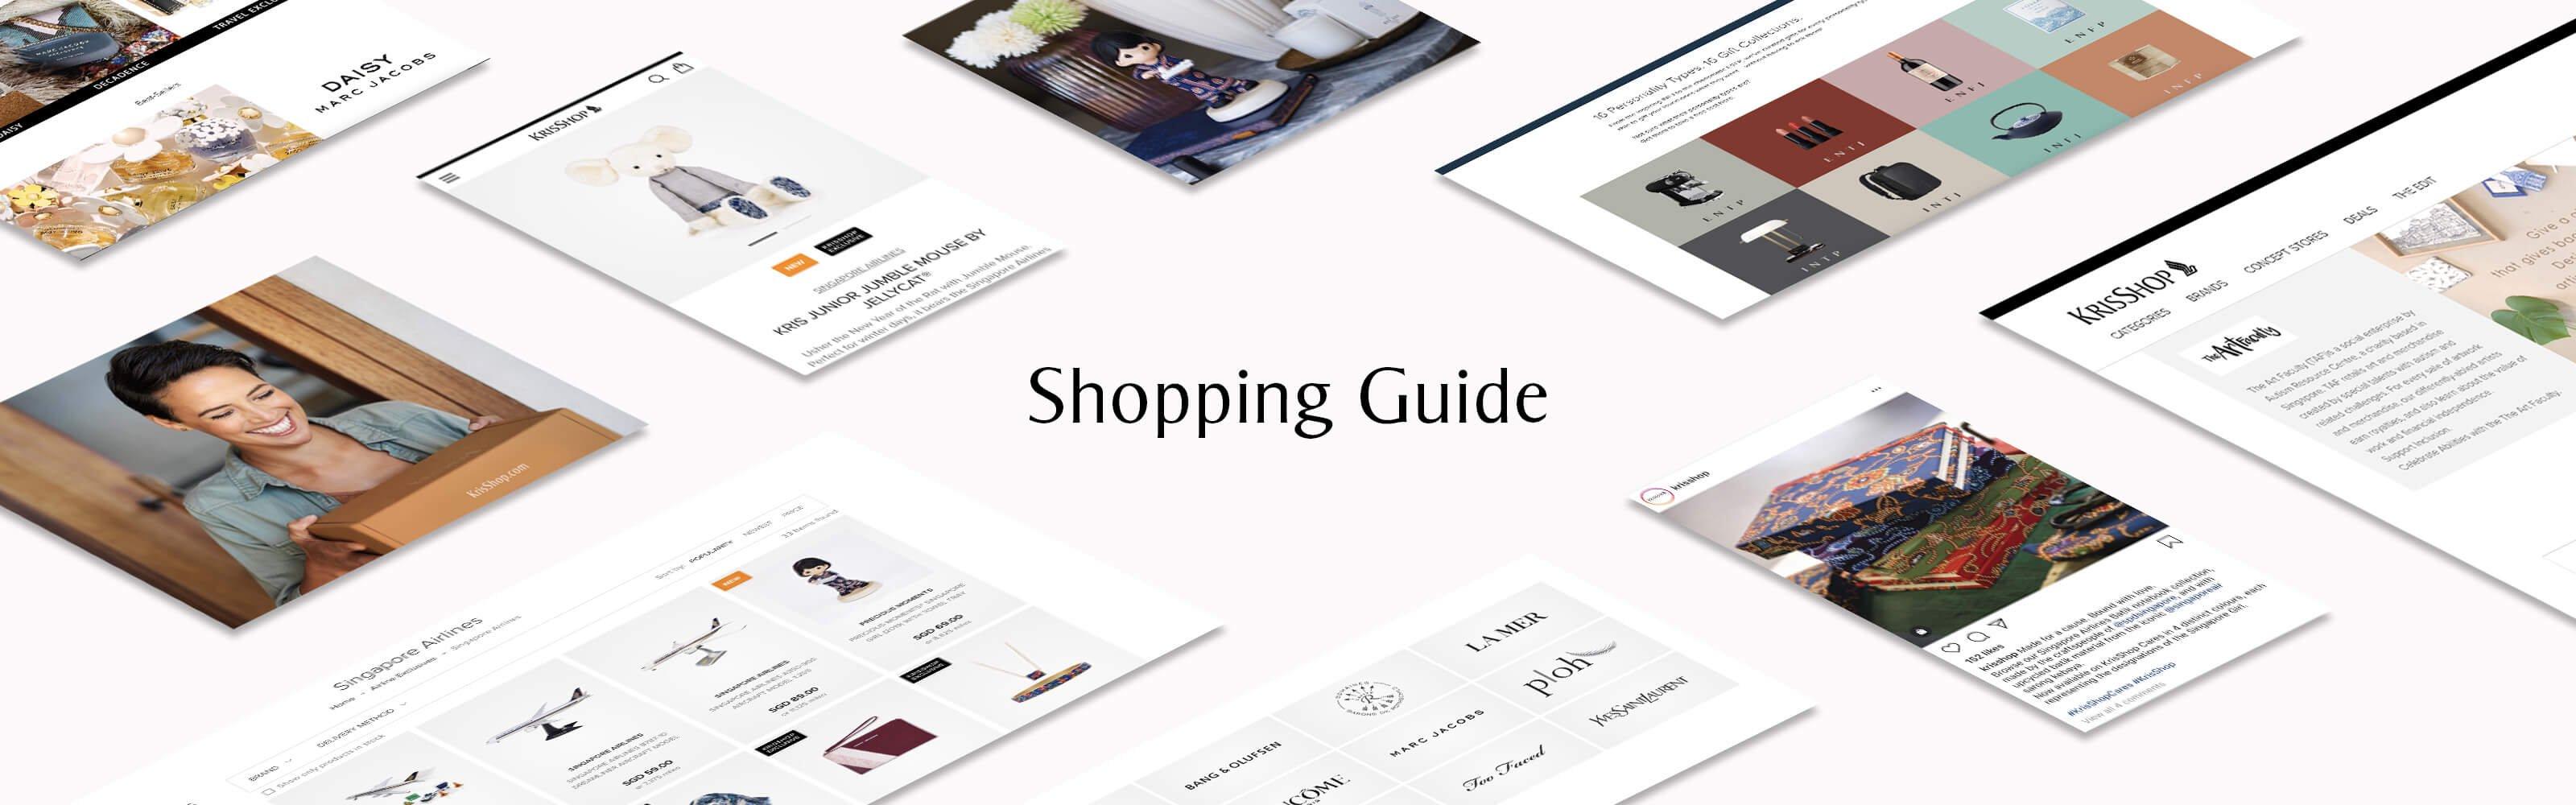 KrisShop Shopping Guide